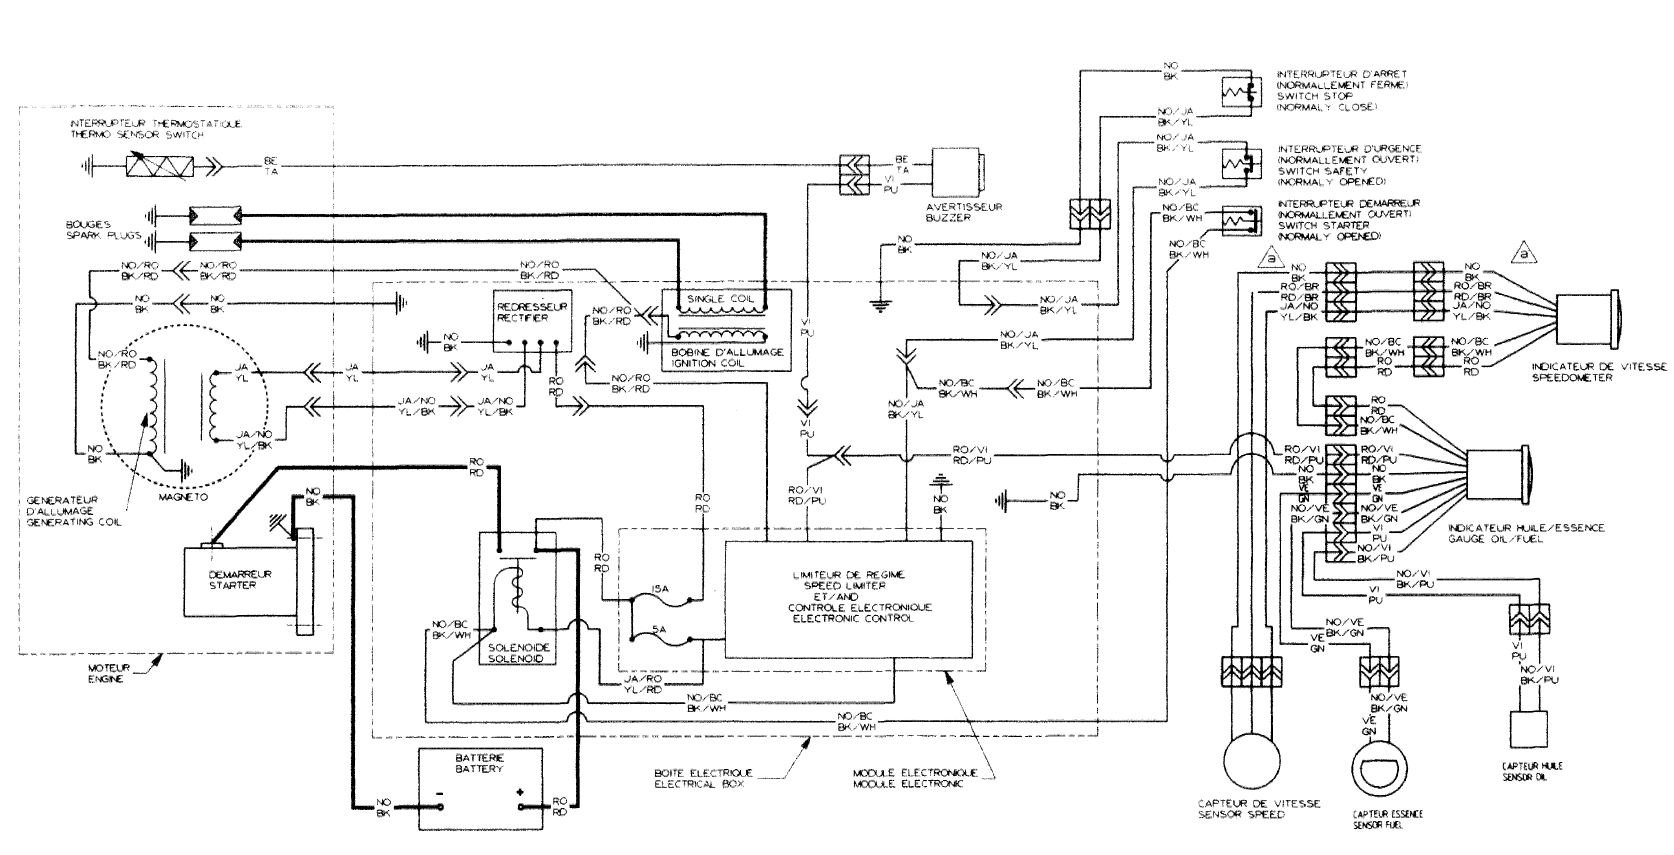 1996 Seadoo Xp Vts Wiring Diagram